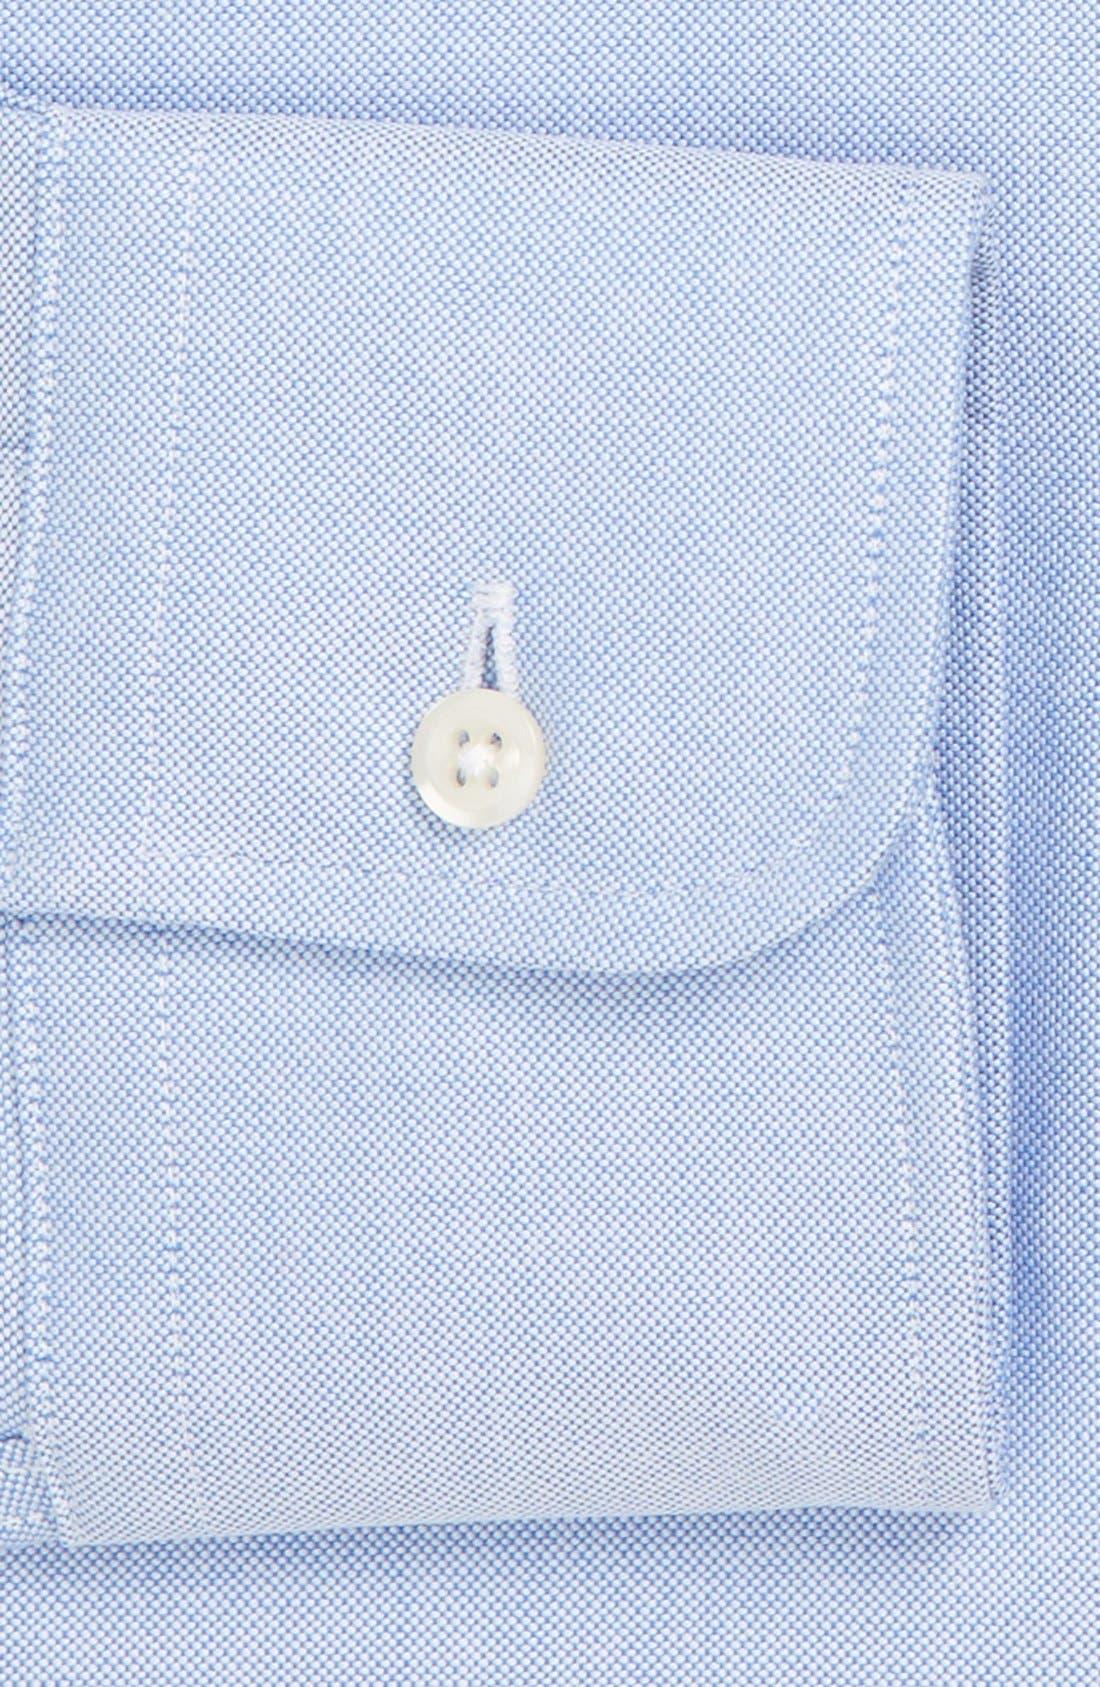 Alternate Image 2  - Gitman 'Cambridge Oxford' Regular Fit Dress Shirt